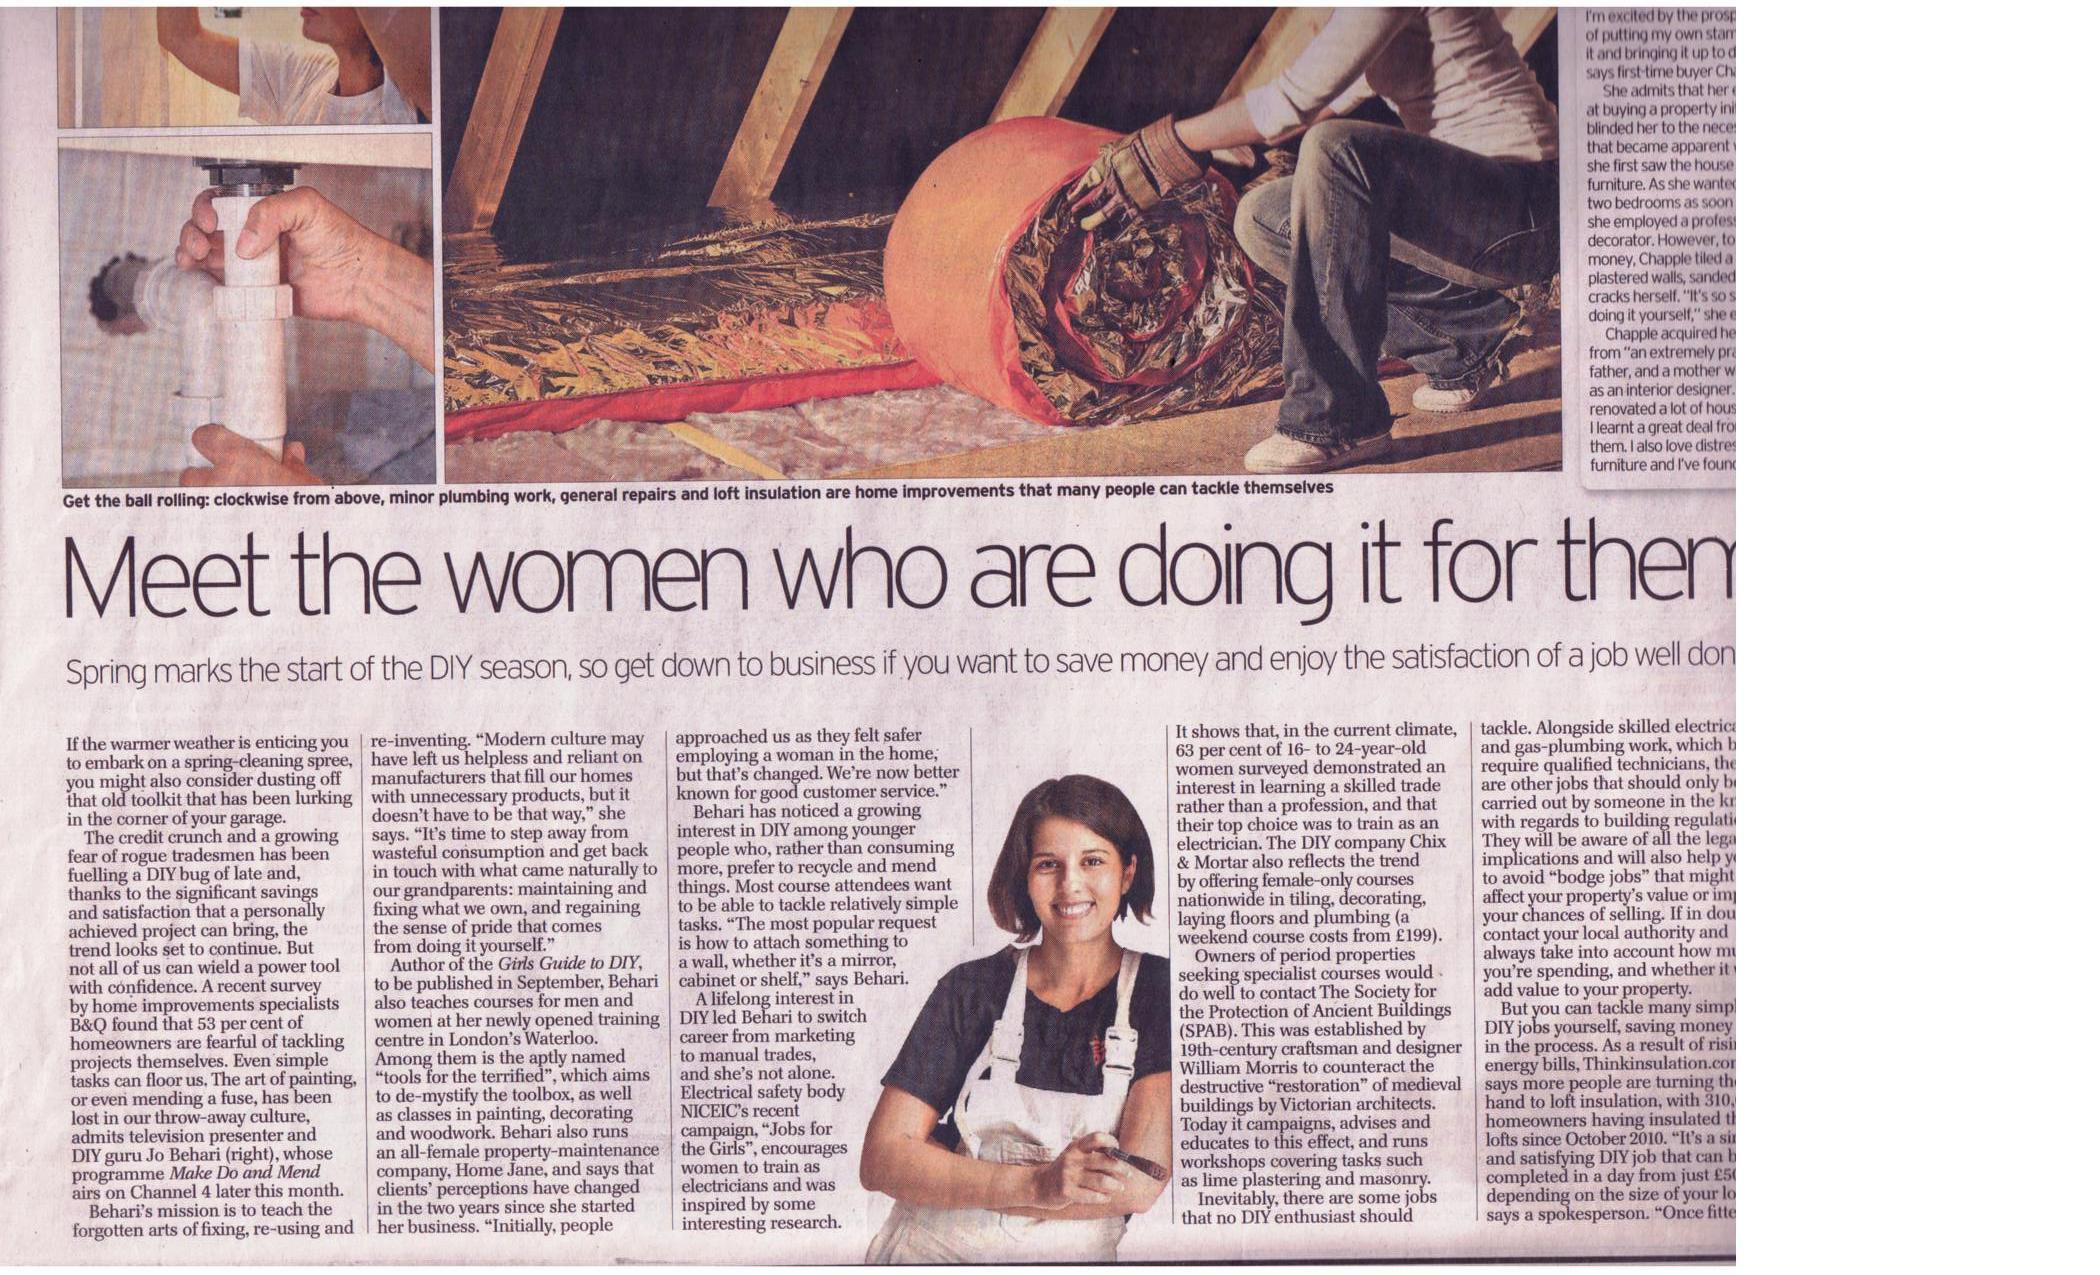 The Daily Telegraph aprill 2011